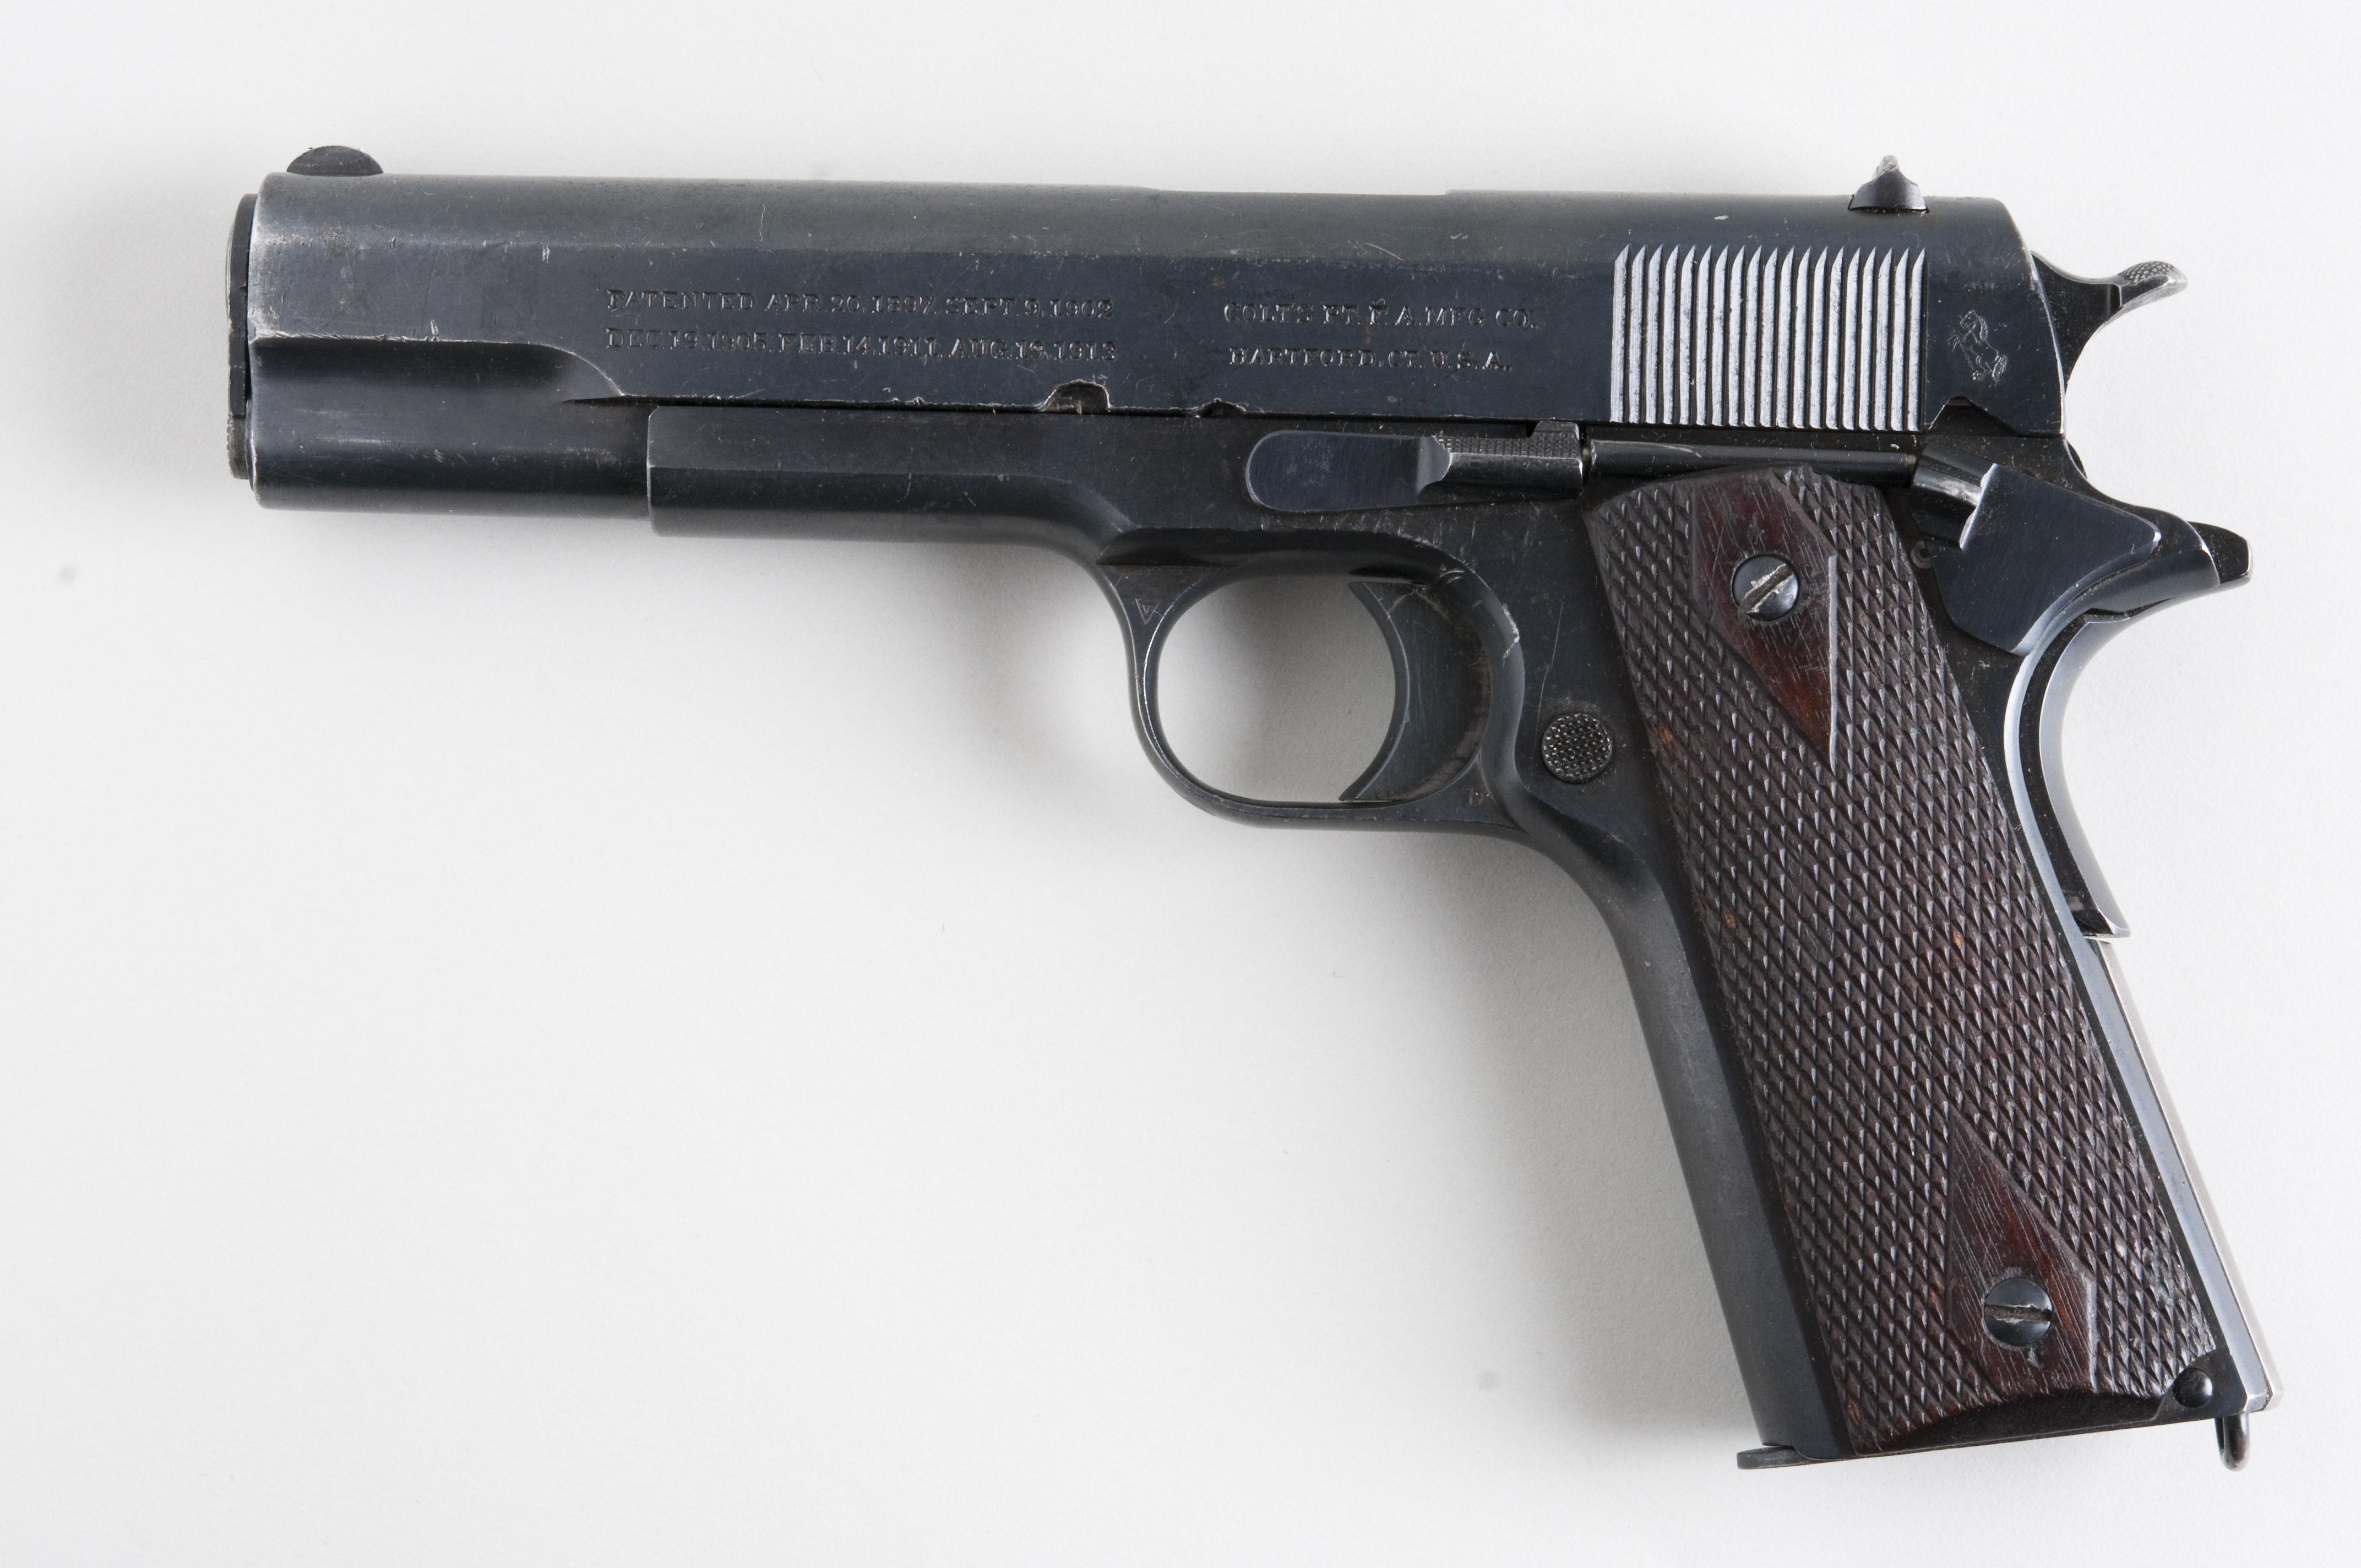 File:Colt 1911 455 (6971784465) jpg - Wikimedia Commons